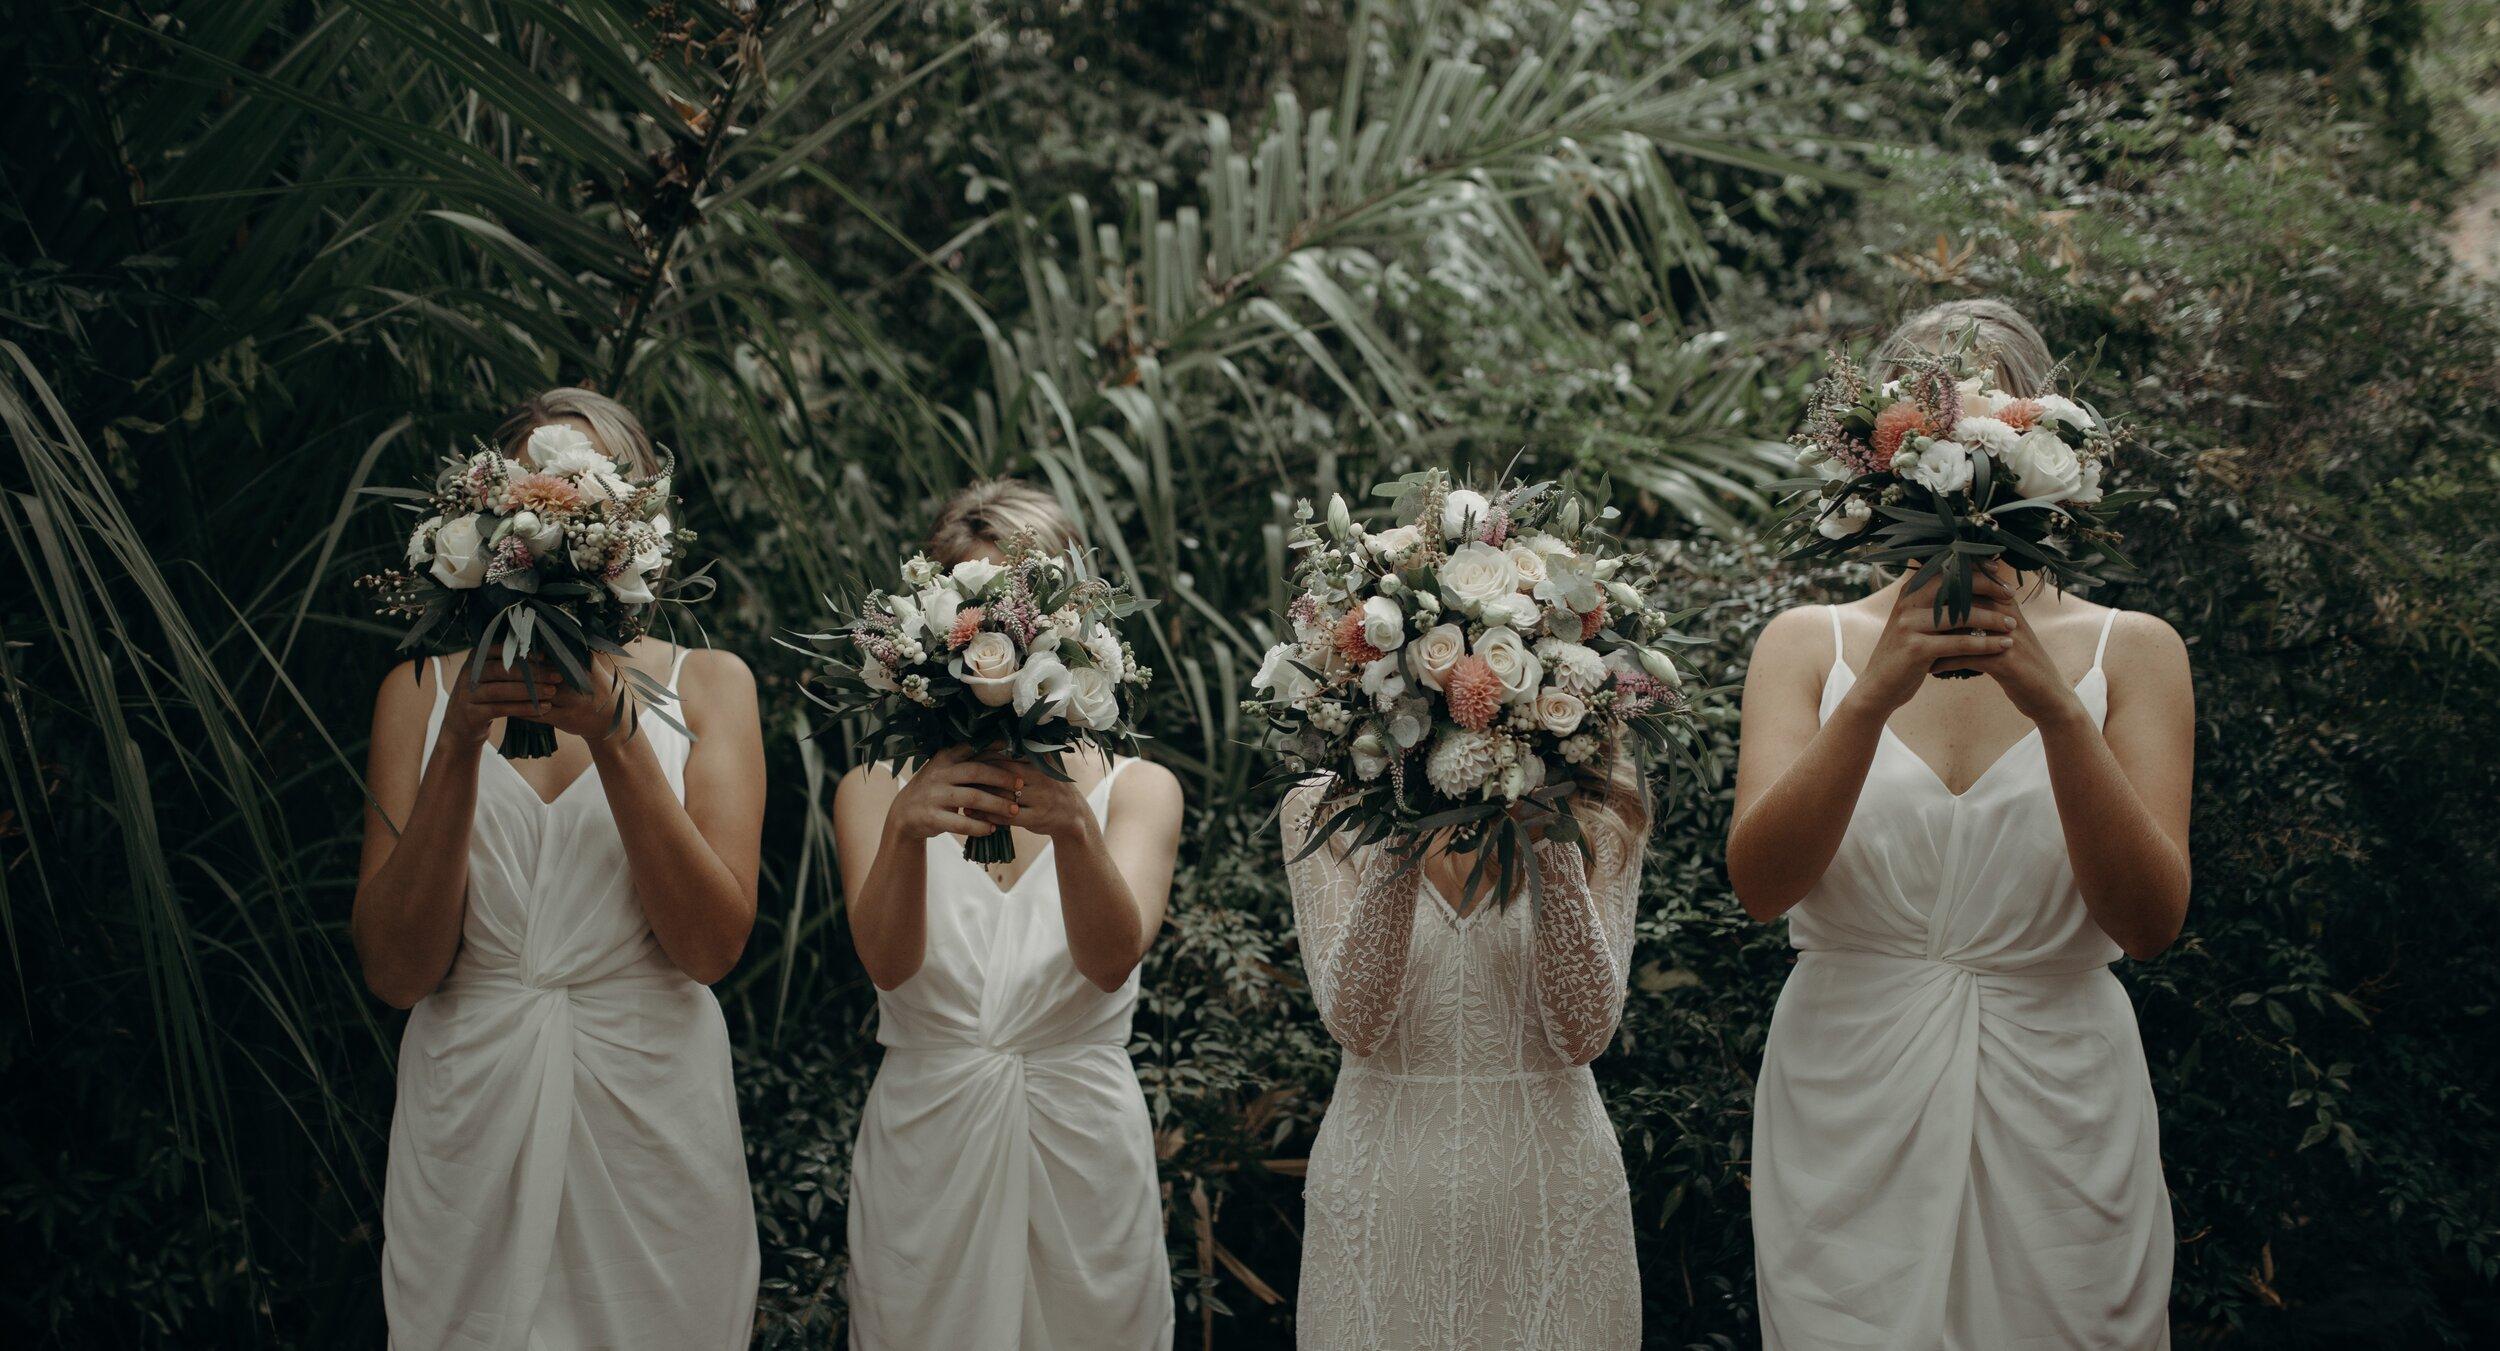 Charlotte's Bridesmaids - Market Lane Media